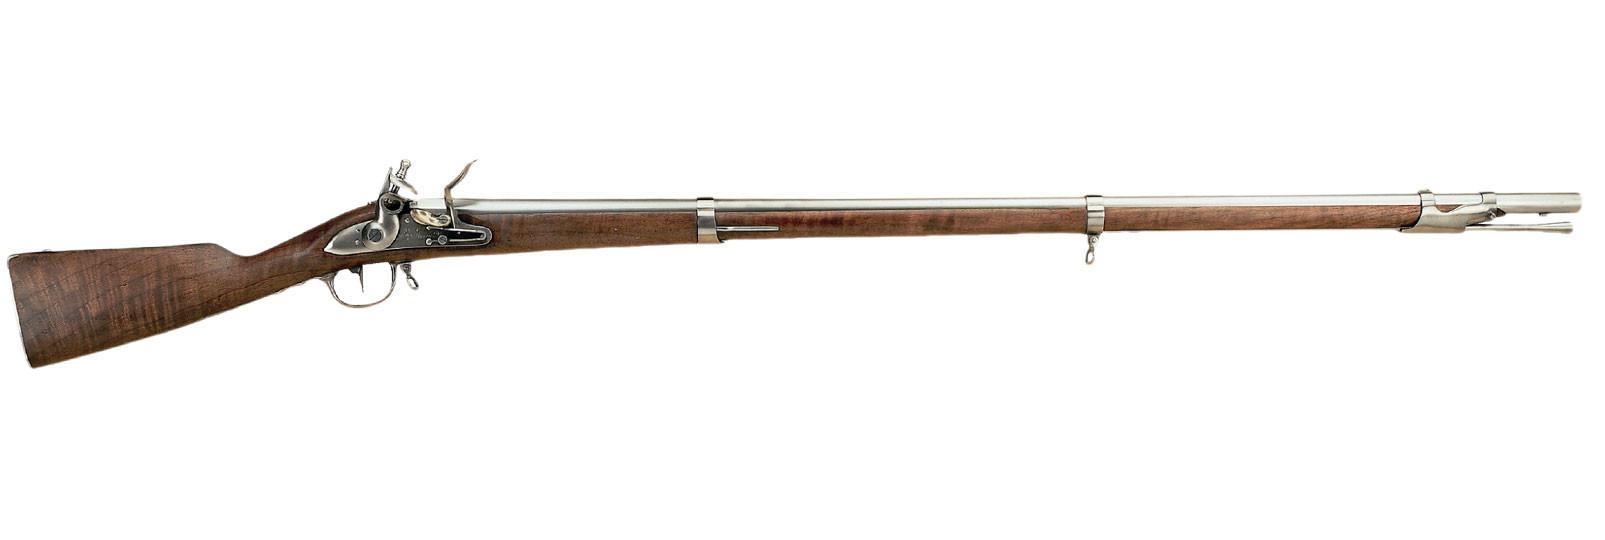 Fucile 1777 Revolutionnaire